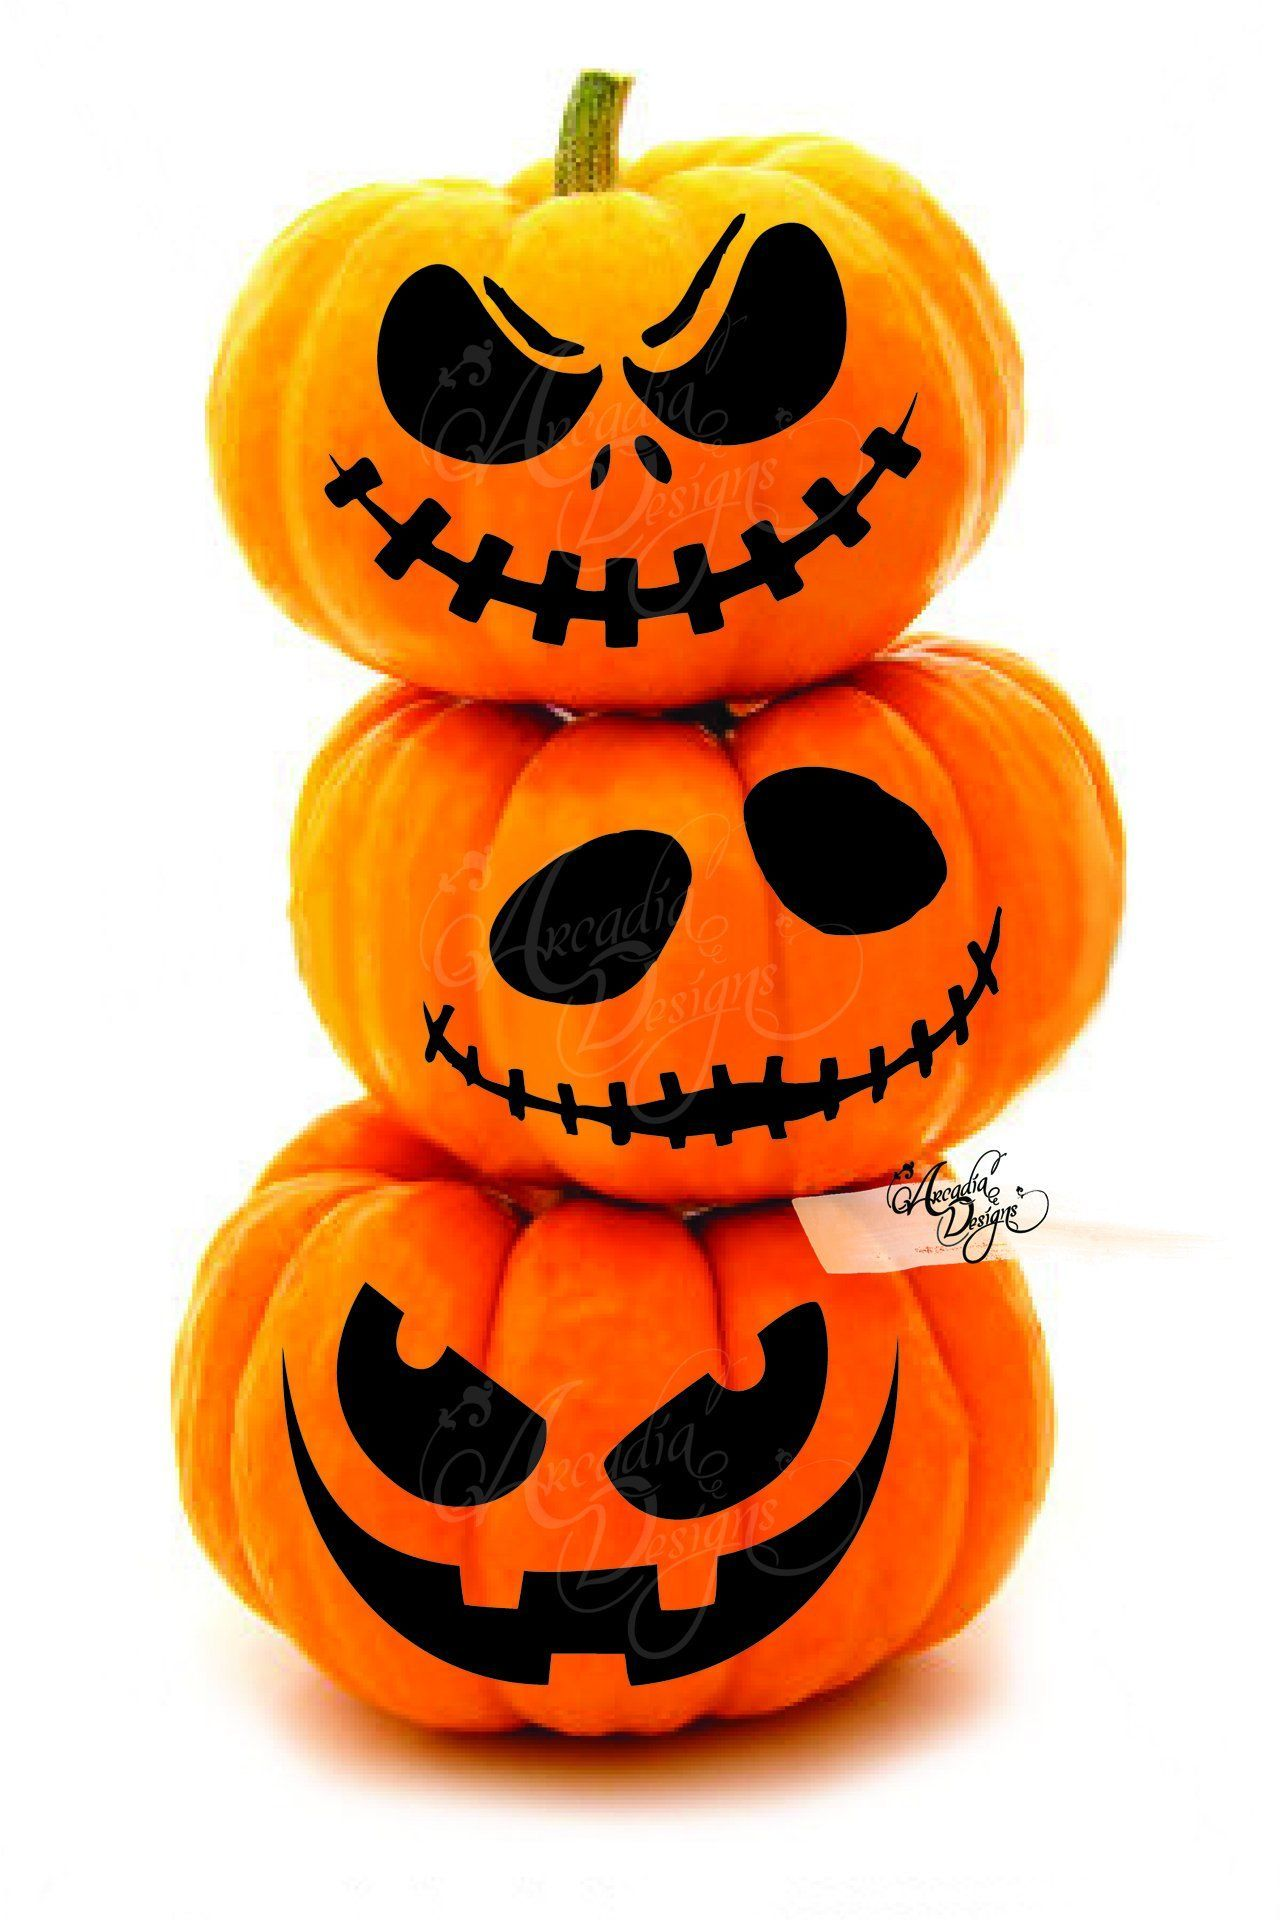 Printable Halloween Pumpkin Carving Pattern Templates